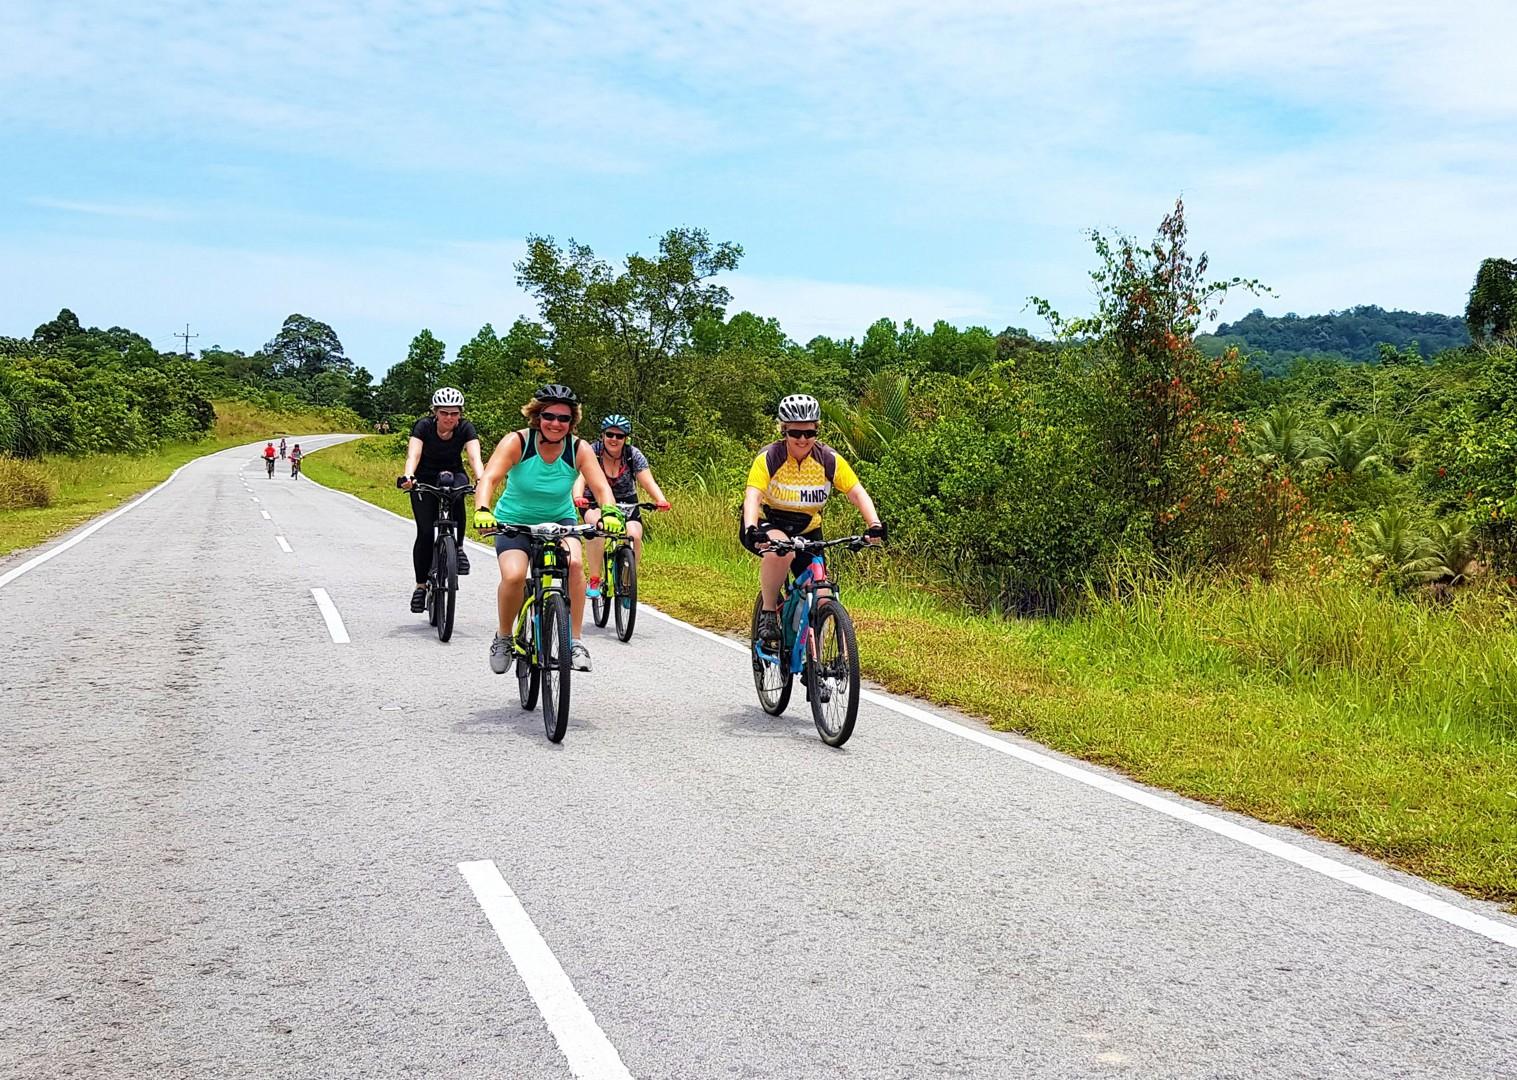 holiday-on-bikes-borneo-skedaddle.jpg - NEW! Borneo - Secret Sarawak - Cycling Adventures